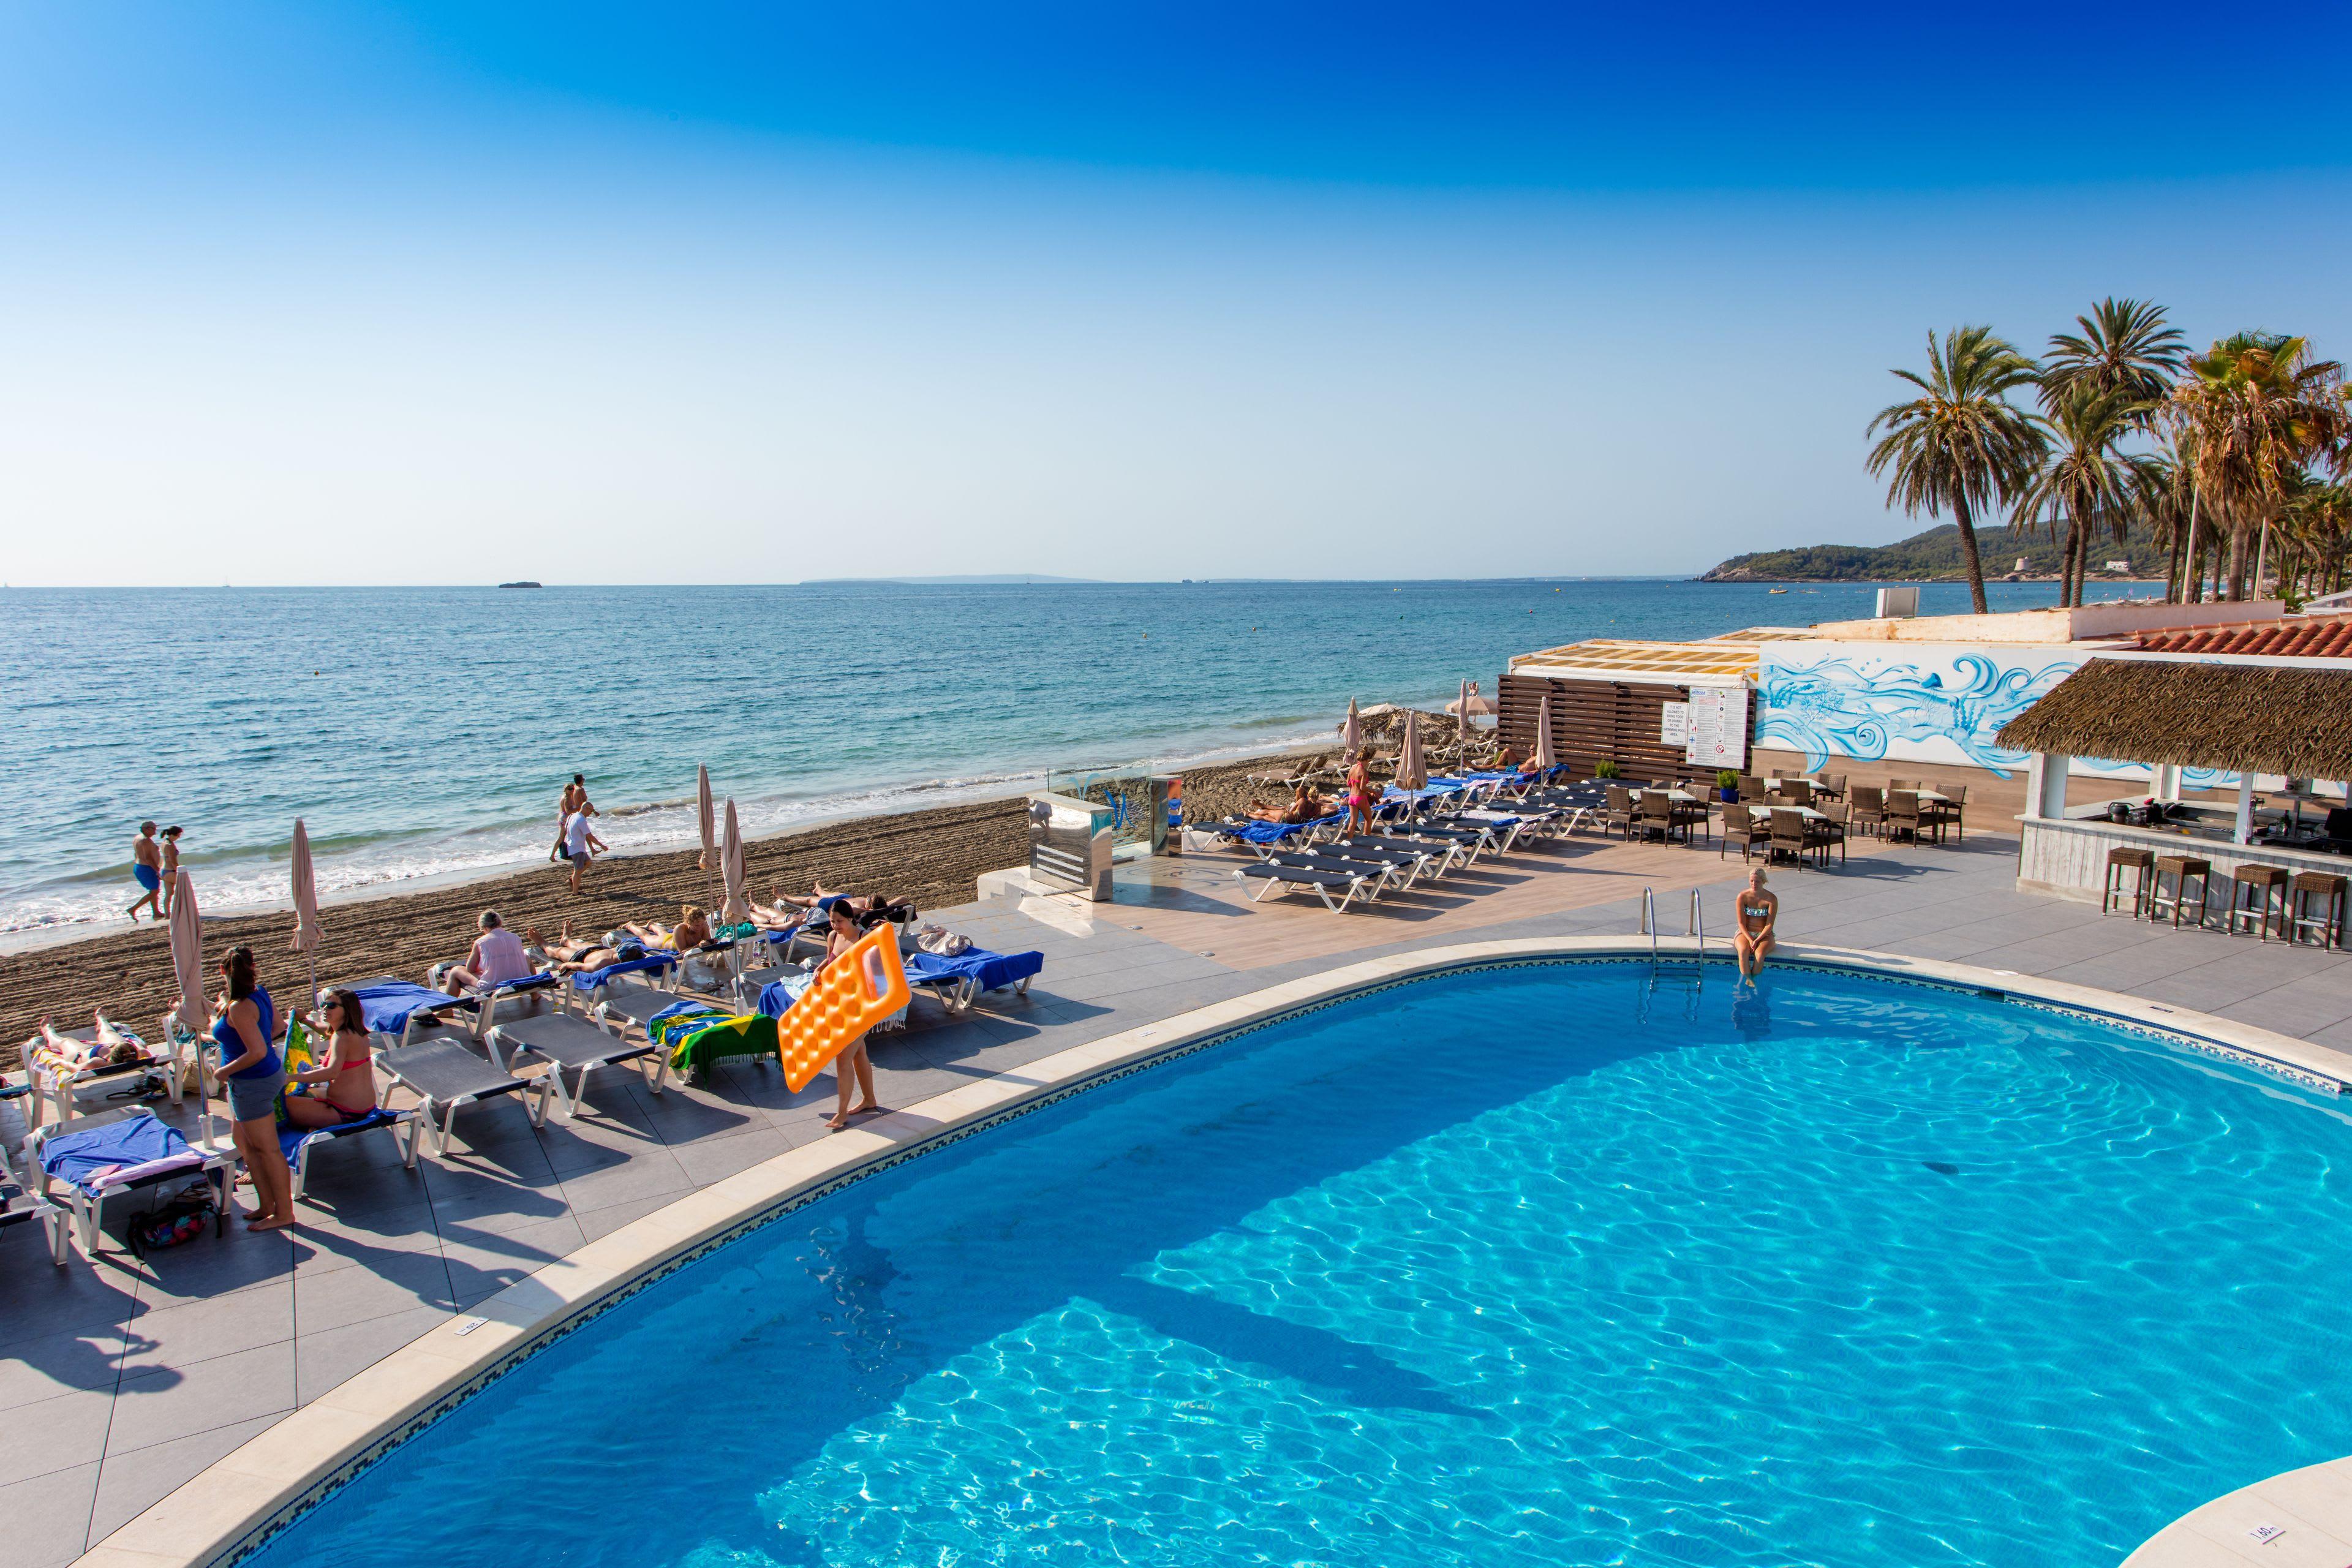 Elegant beachfront holiday apartment with swimming pool, PLAYA DEN BOSSA – Property Code: Srsplaya